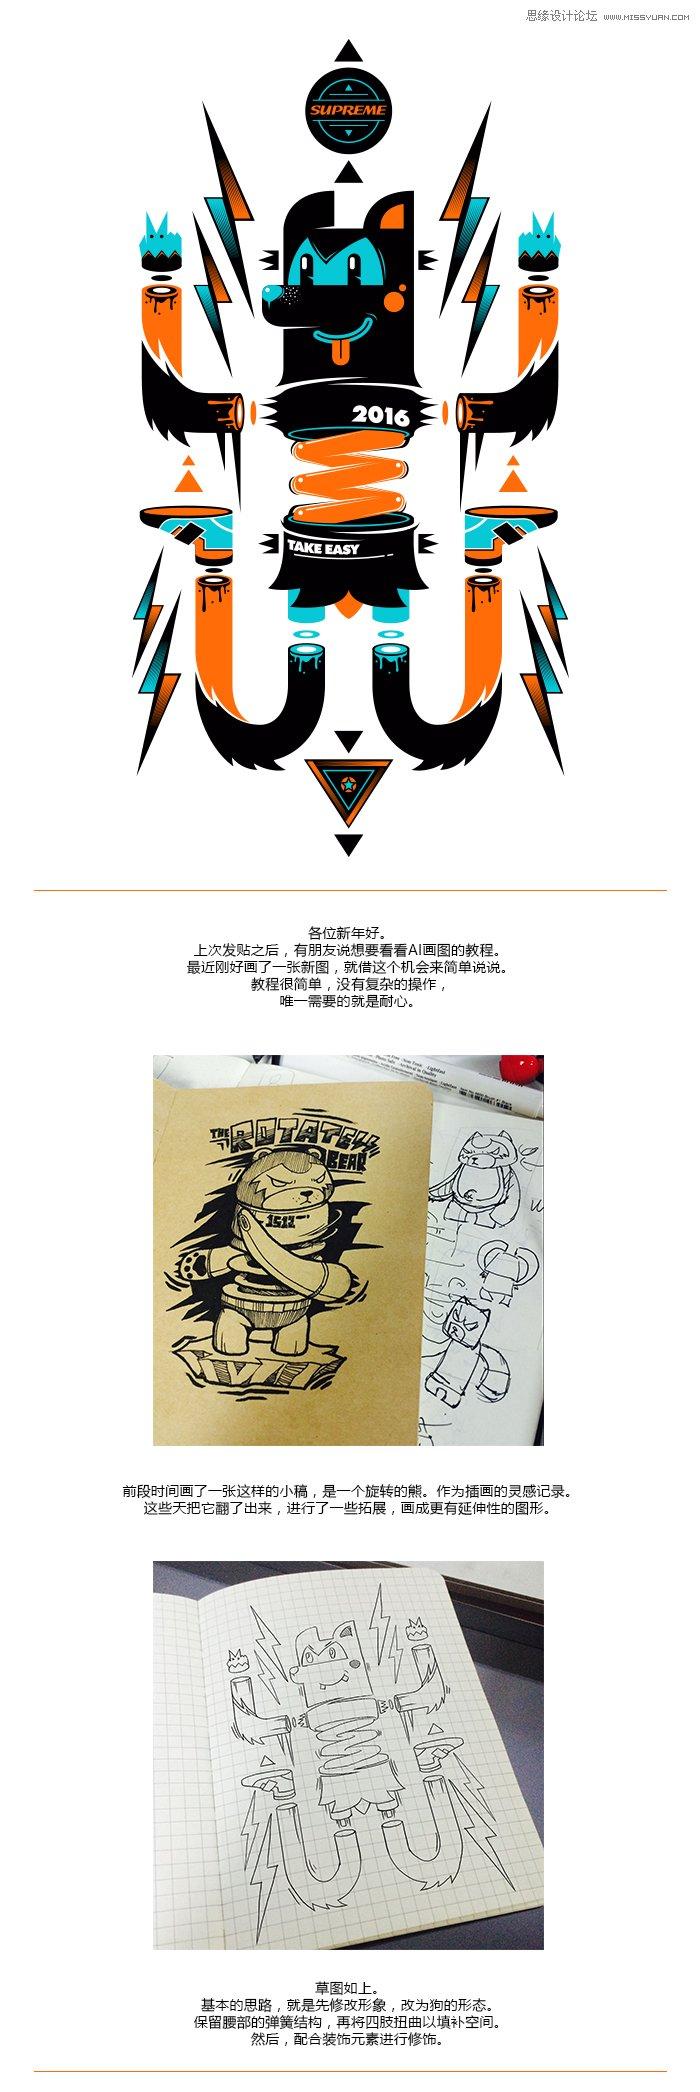 Illustrator绘制创意的扭曲狗子插画教程